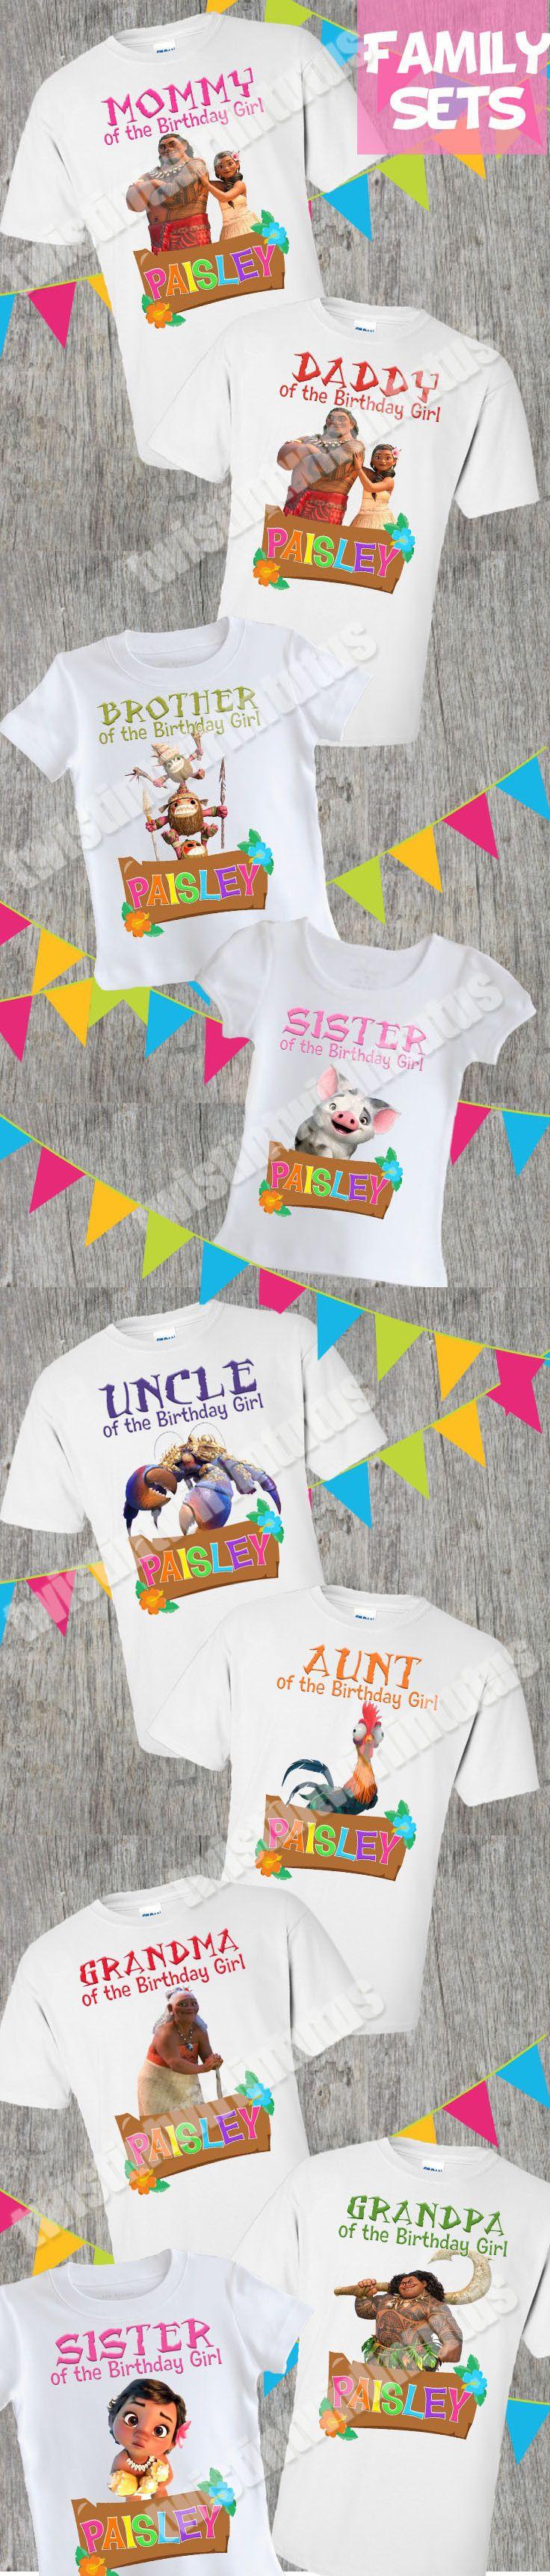 d53310ef Moana Family Birthday Shirts | Moana Birthday Shirt | Moana Birthday Party  Ideas | Moana Family Shirts | Birthday Ideas for Girls | Twistin Twirlin  Tutus # ...